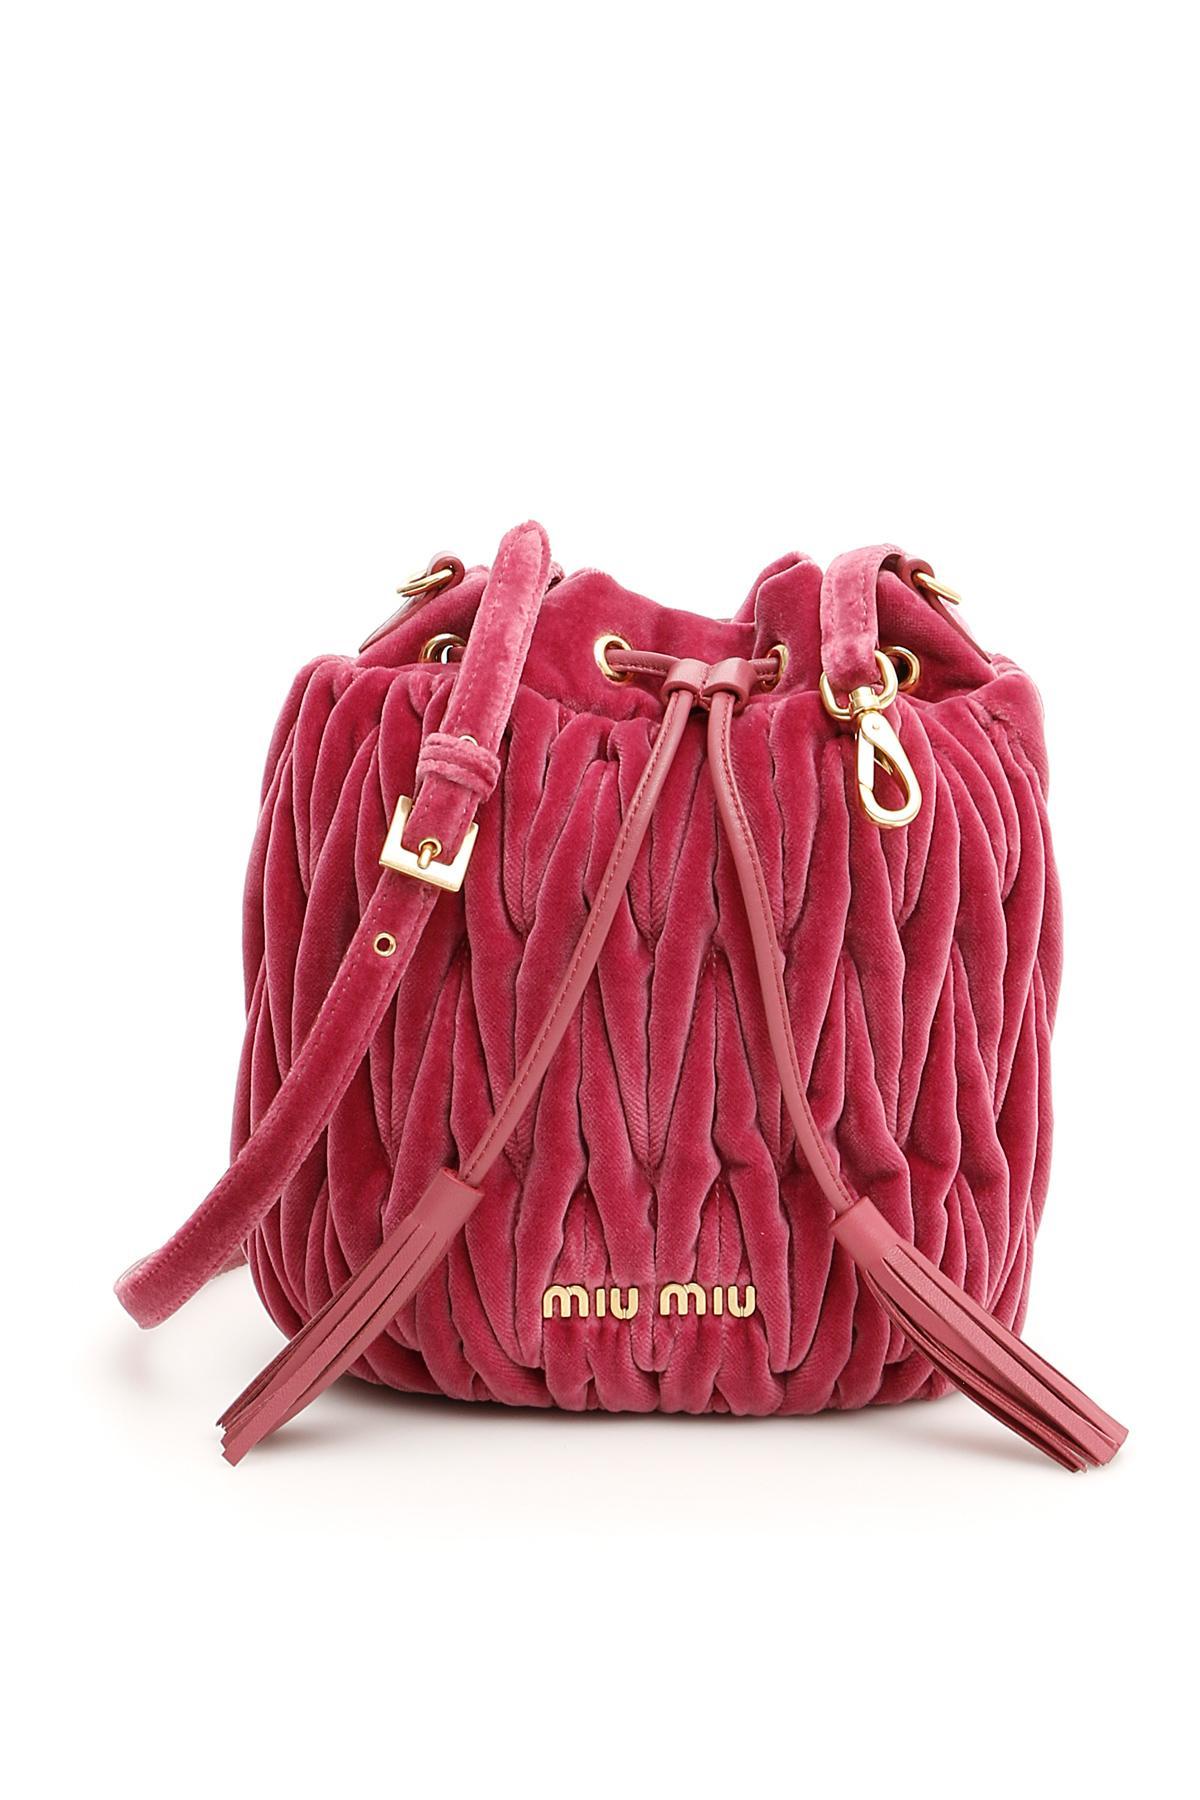 4efe9828dfa3 Lyst - Miu Miu Velvet Matelassé Bucket Bag in Red